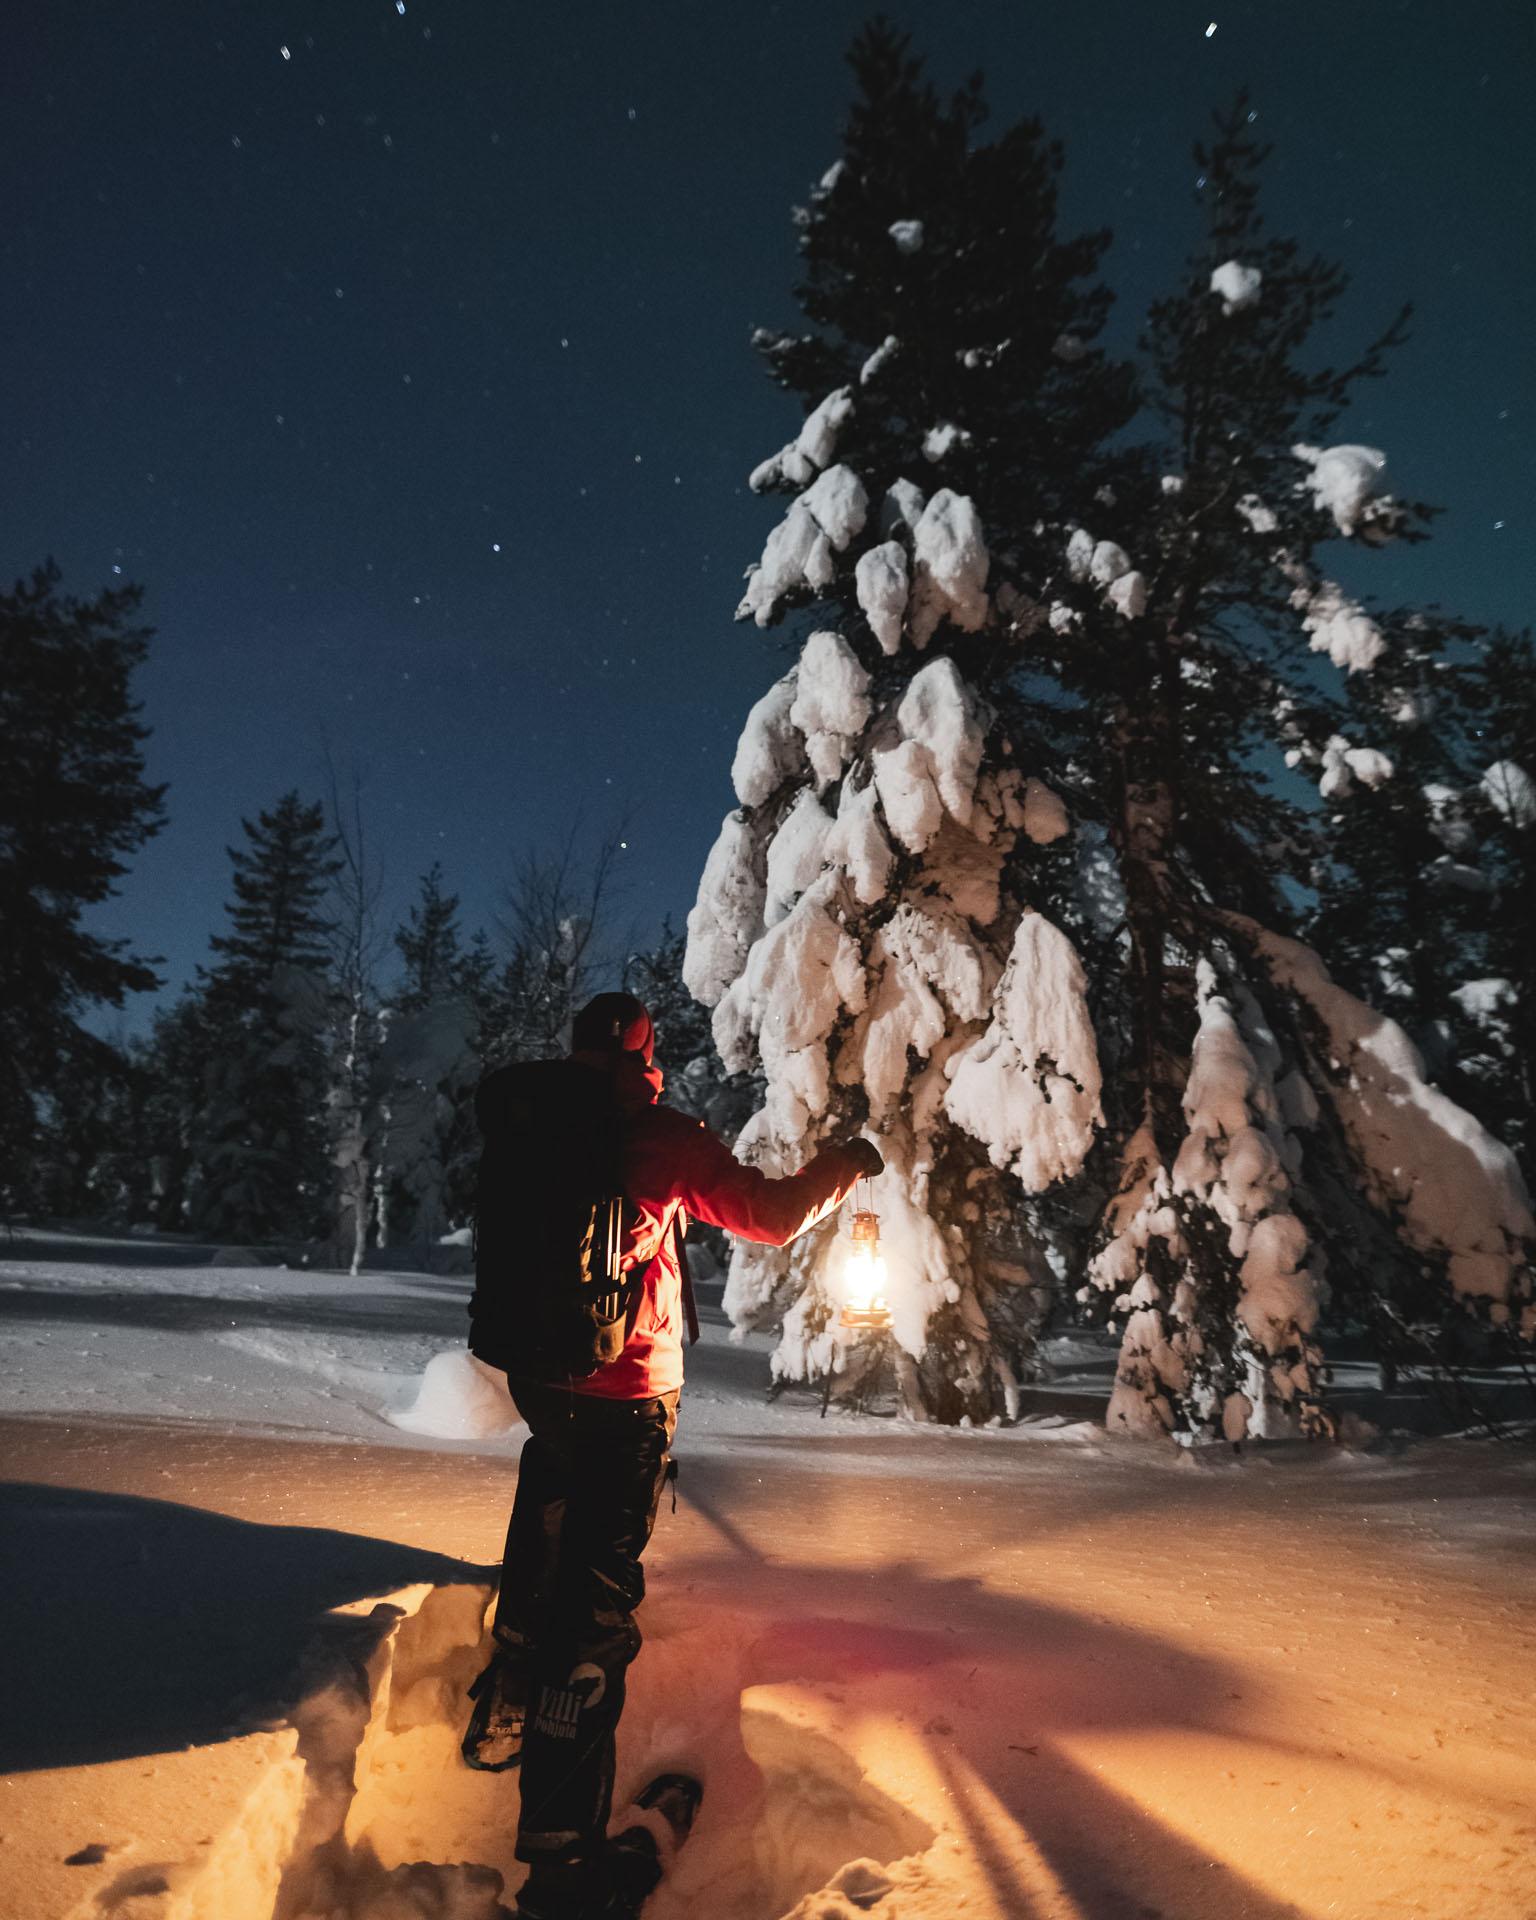 Evening Snowshoe Hike – 4 (Michael Mead)